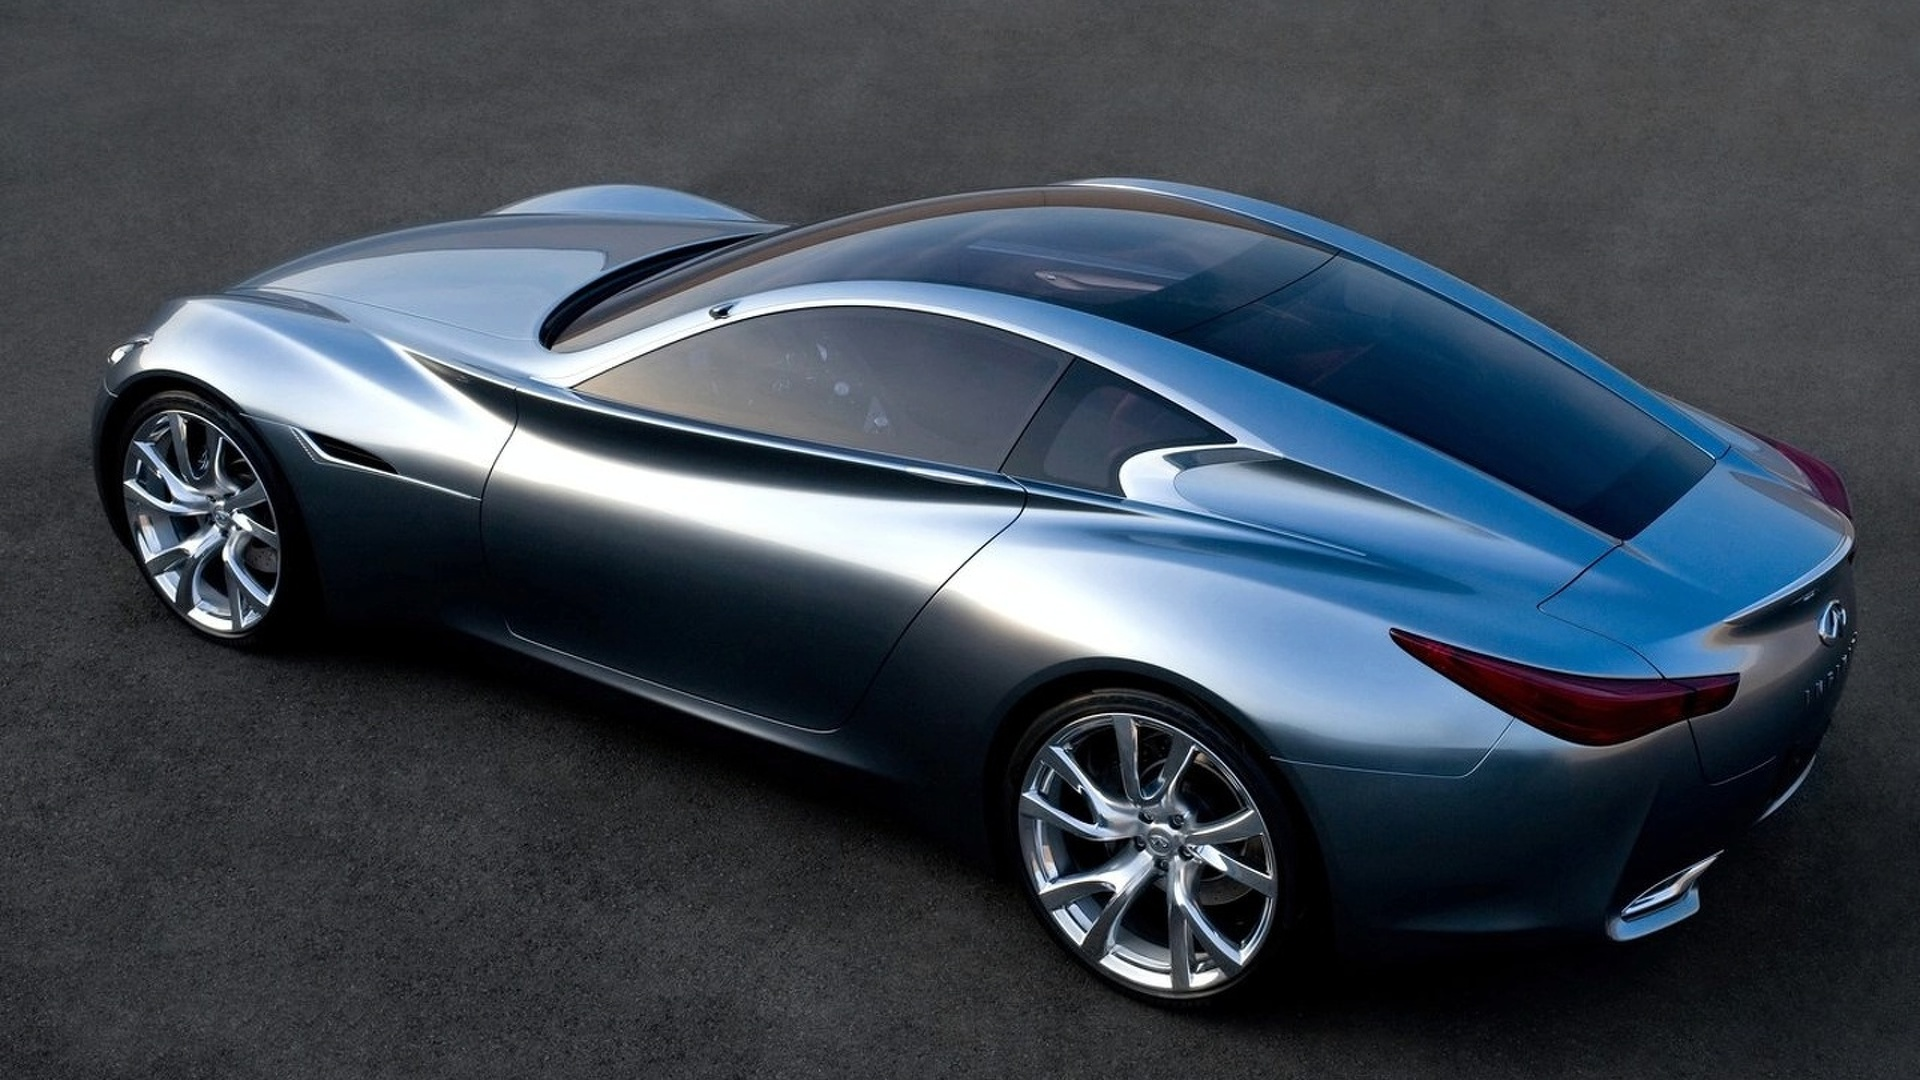 Infiniti working on 700 bhp flagship hybrid sedan based on essence concept report